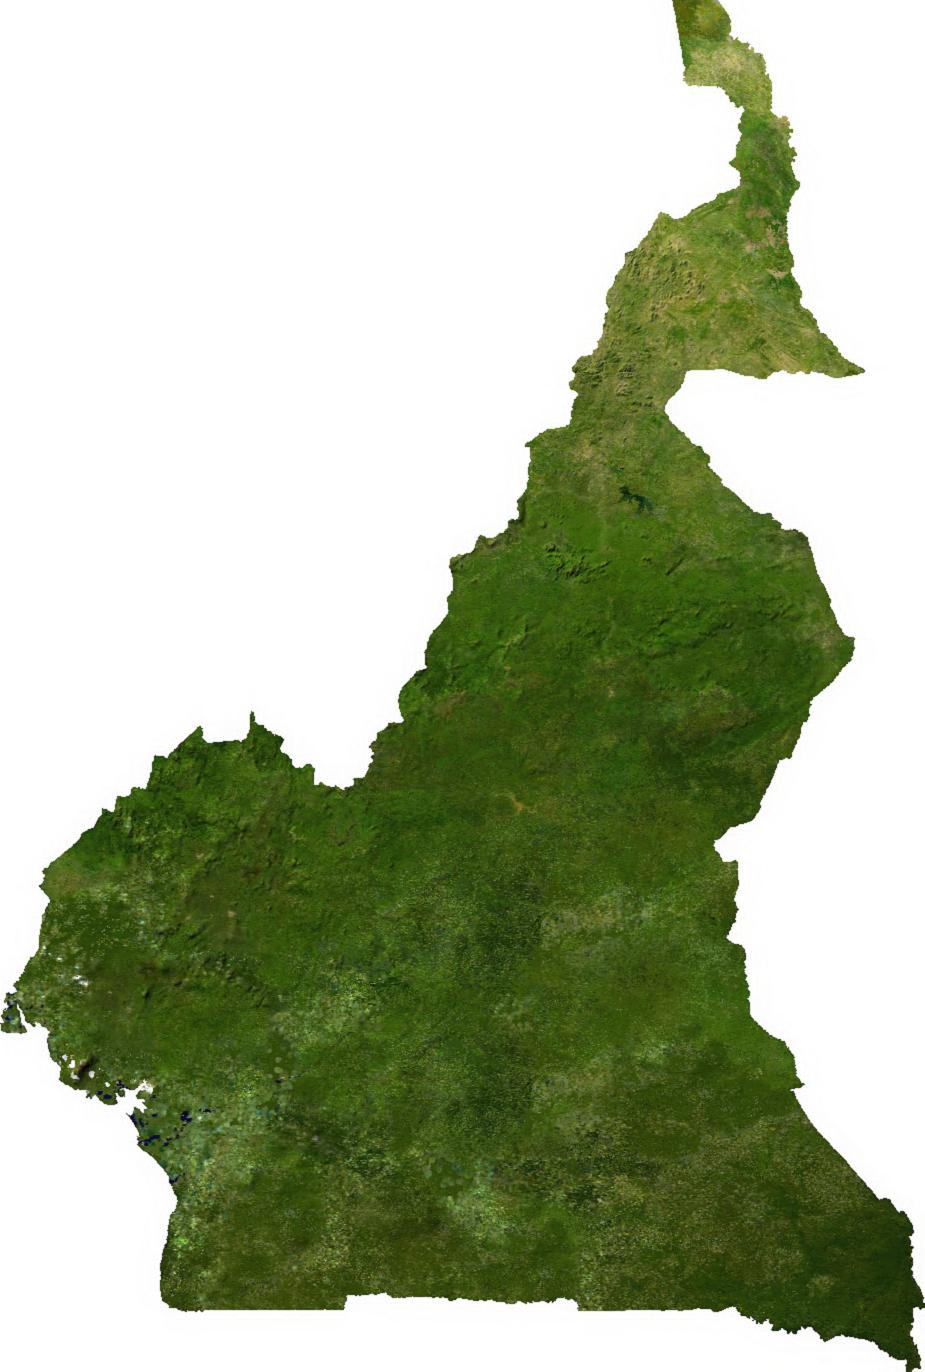 Cameroon sat